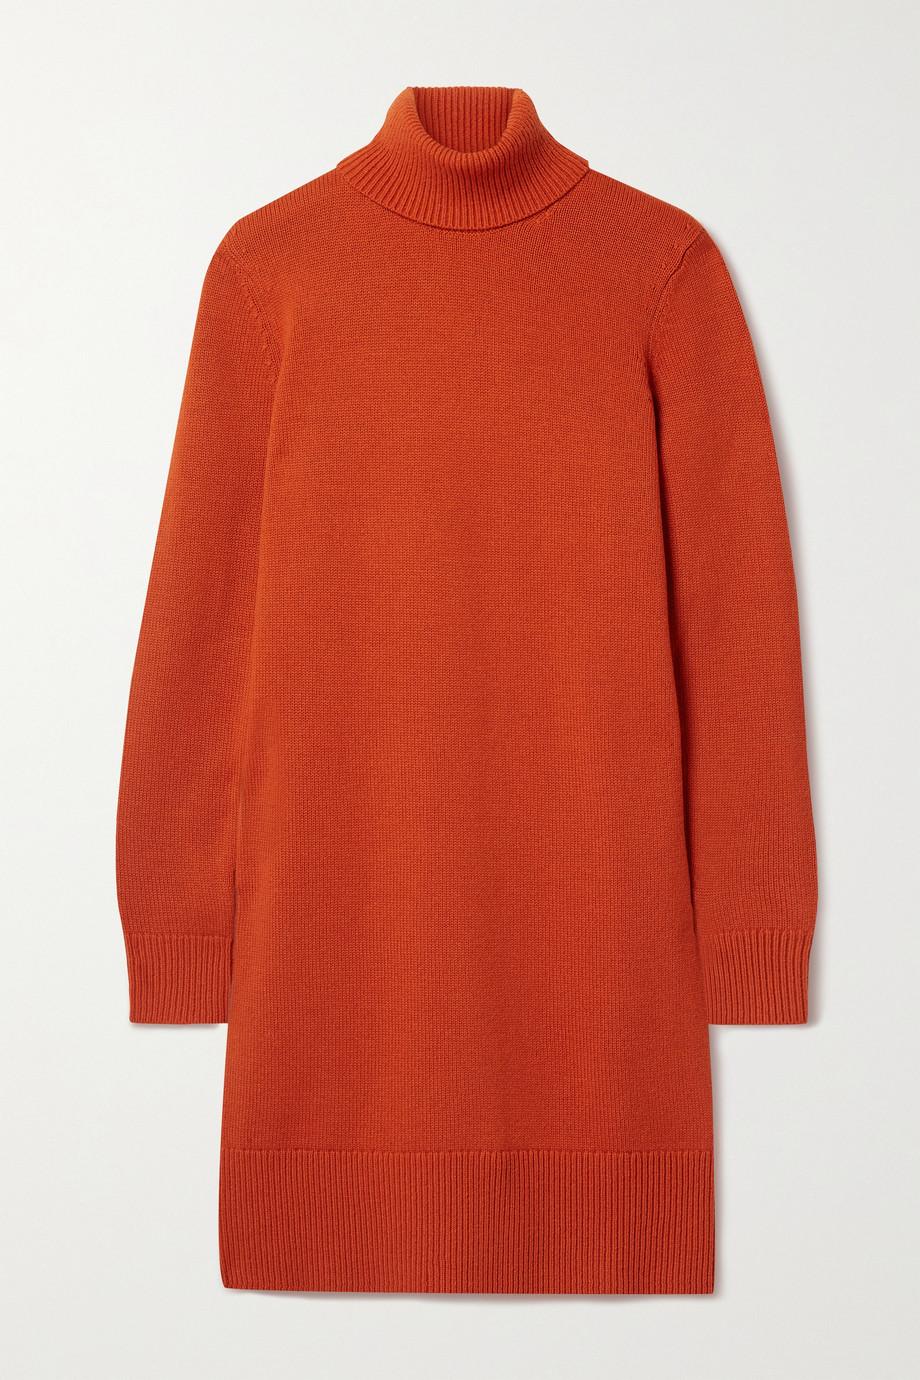 Michael Kors Collection Cashmere turtleneck dress